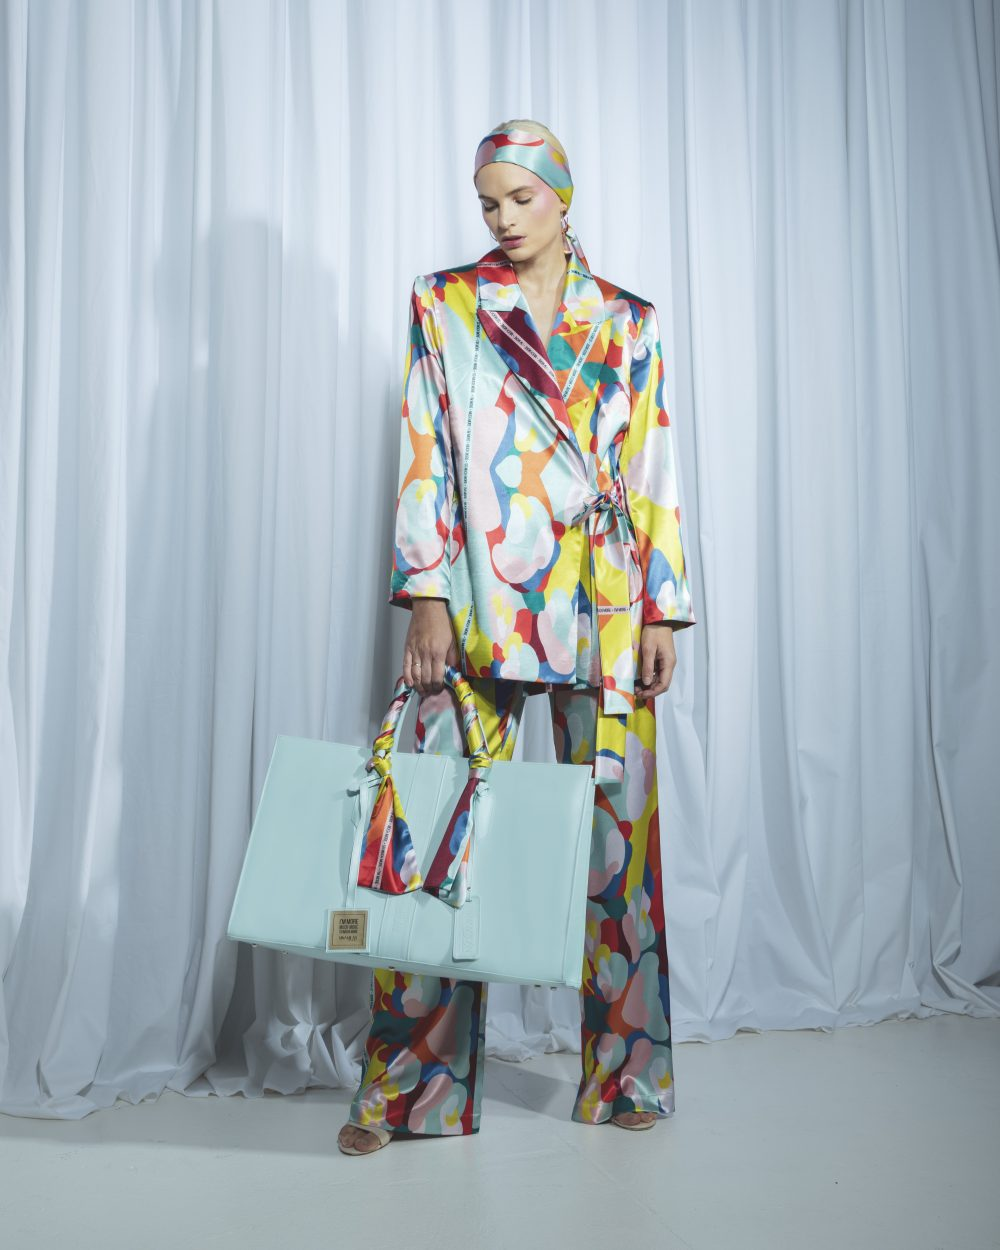 389A0017 e1604590259361 #BFWreport   modna revija NINAMILÁN studia